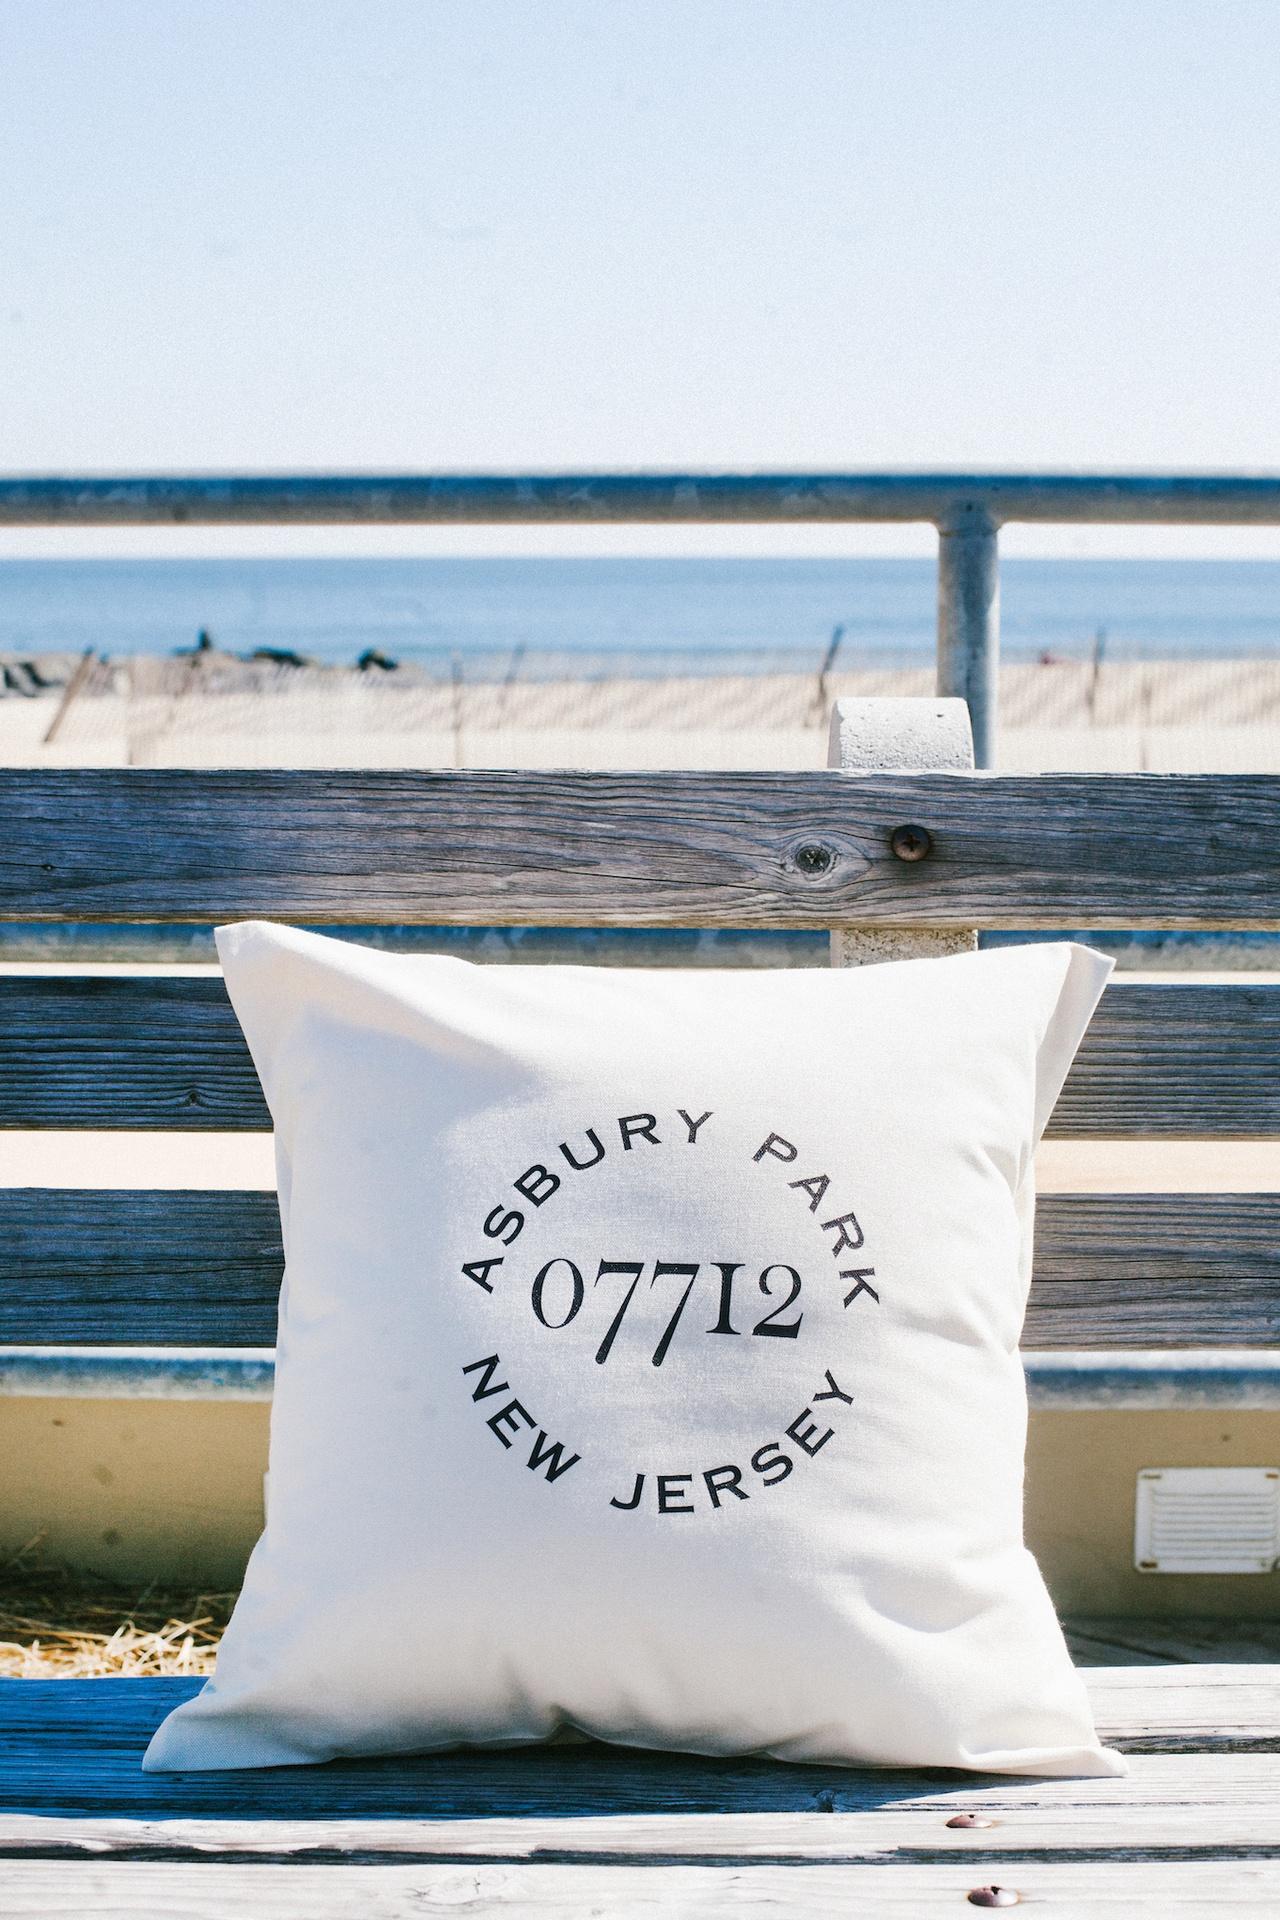 Asbury Park Zip Code Pillow